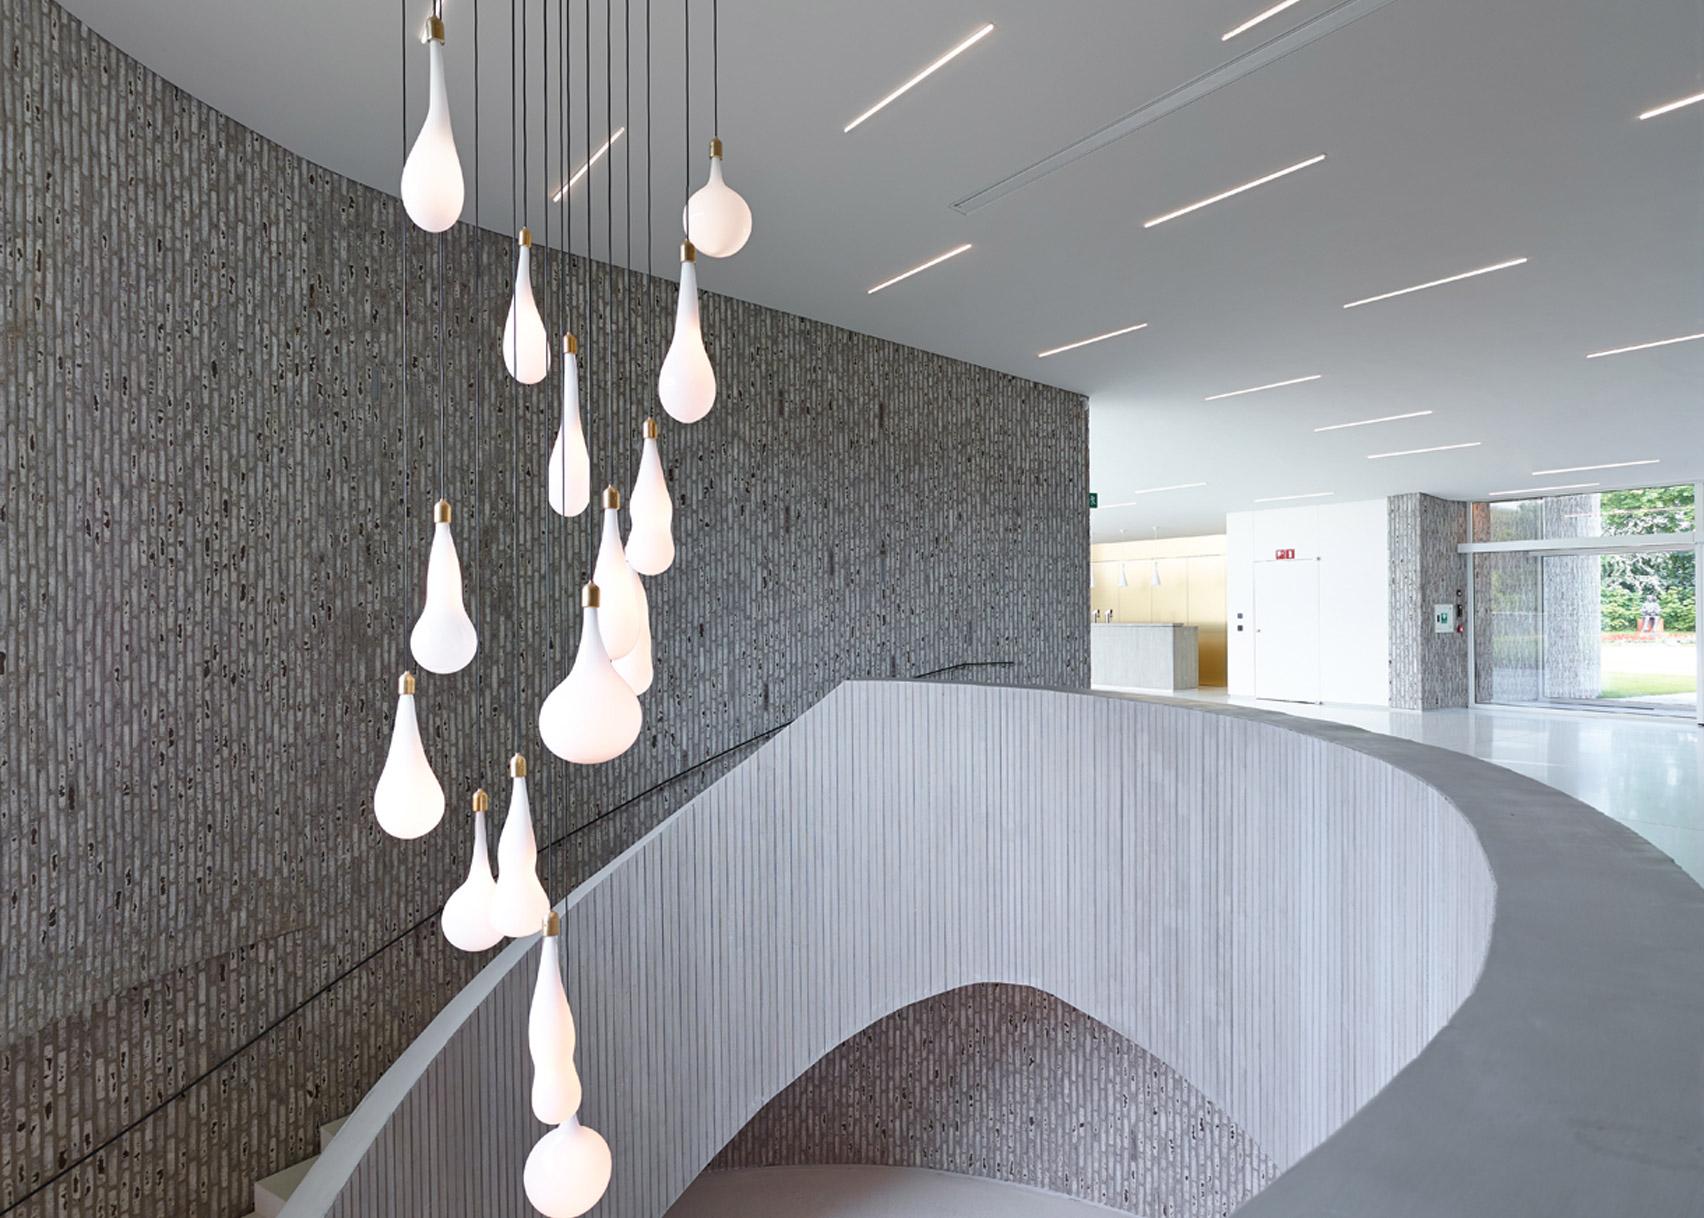 Kortrijk Auditorium by Dehullu Architecten on the top 10 brick interiors on Dezeen's Pinterest boards